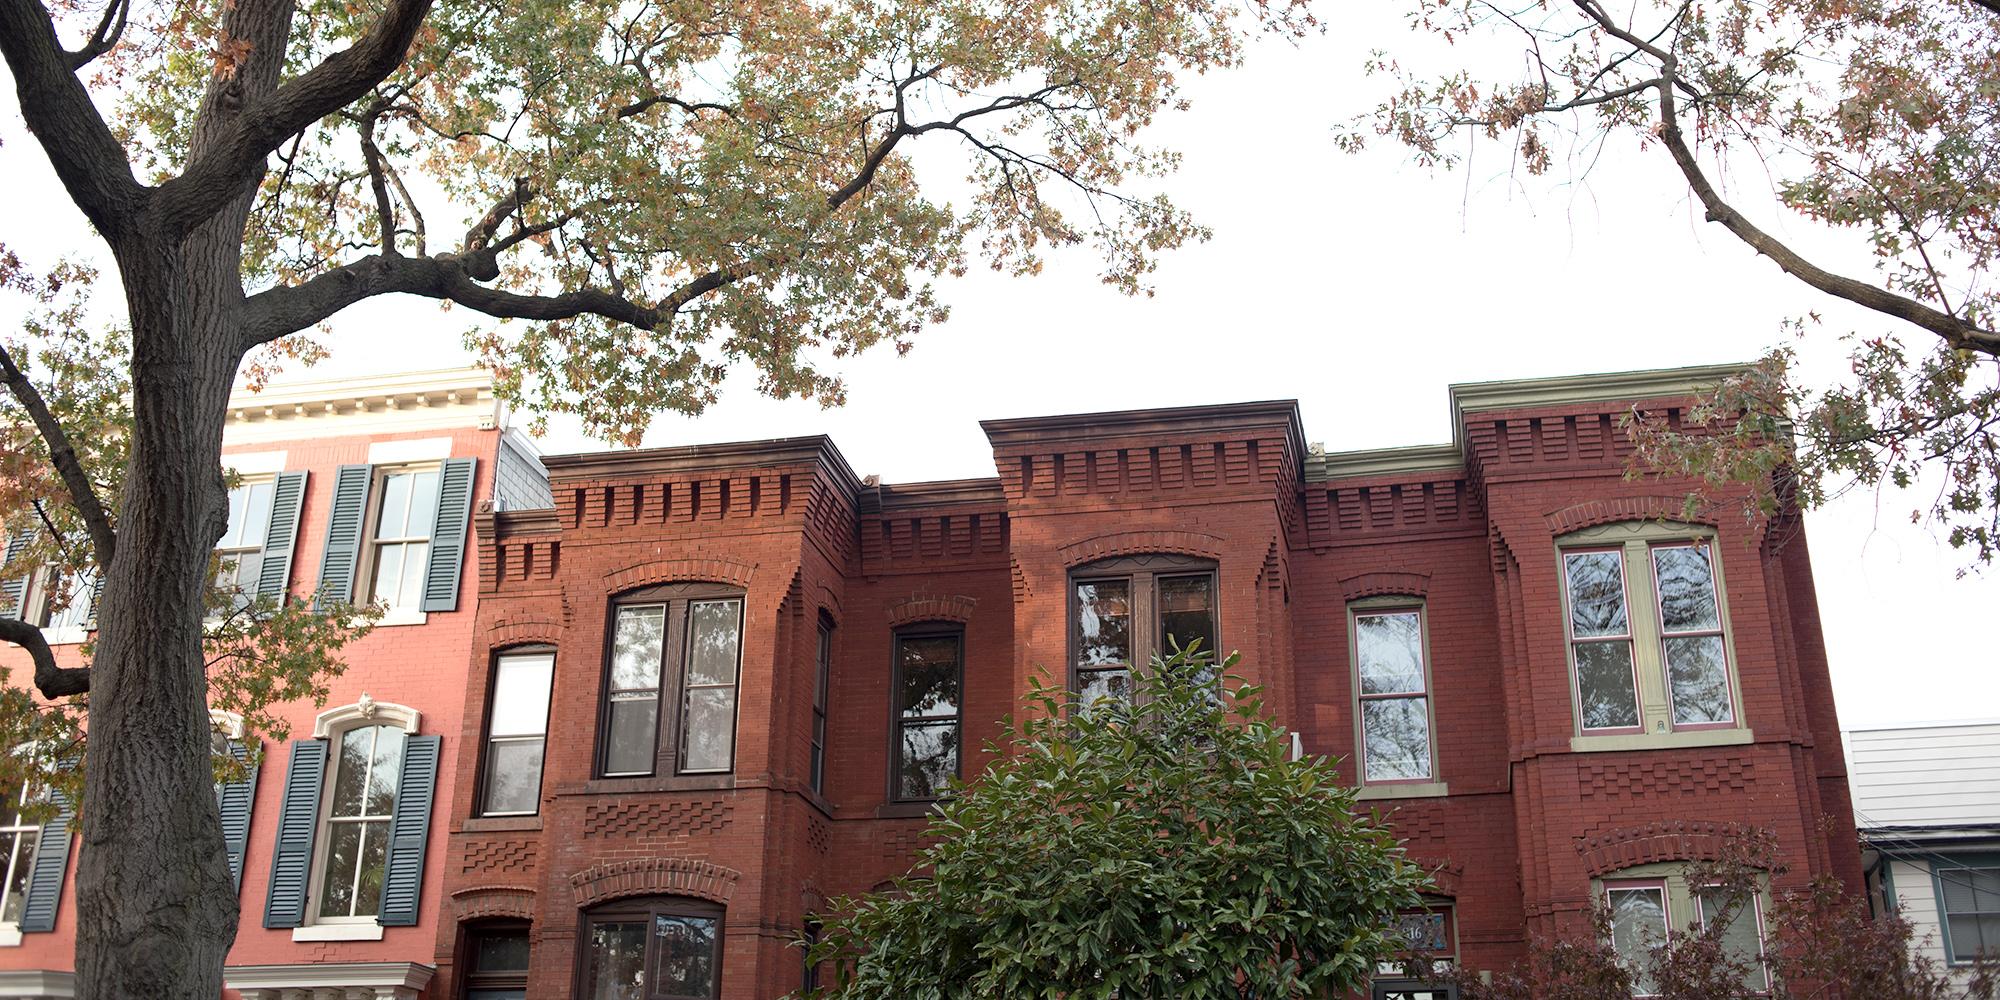 19TH CENTURY ROW HOUSES